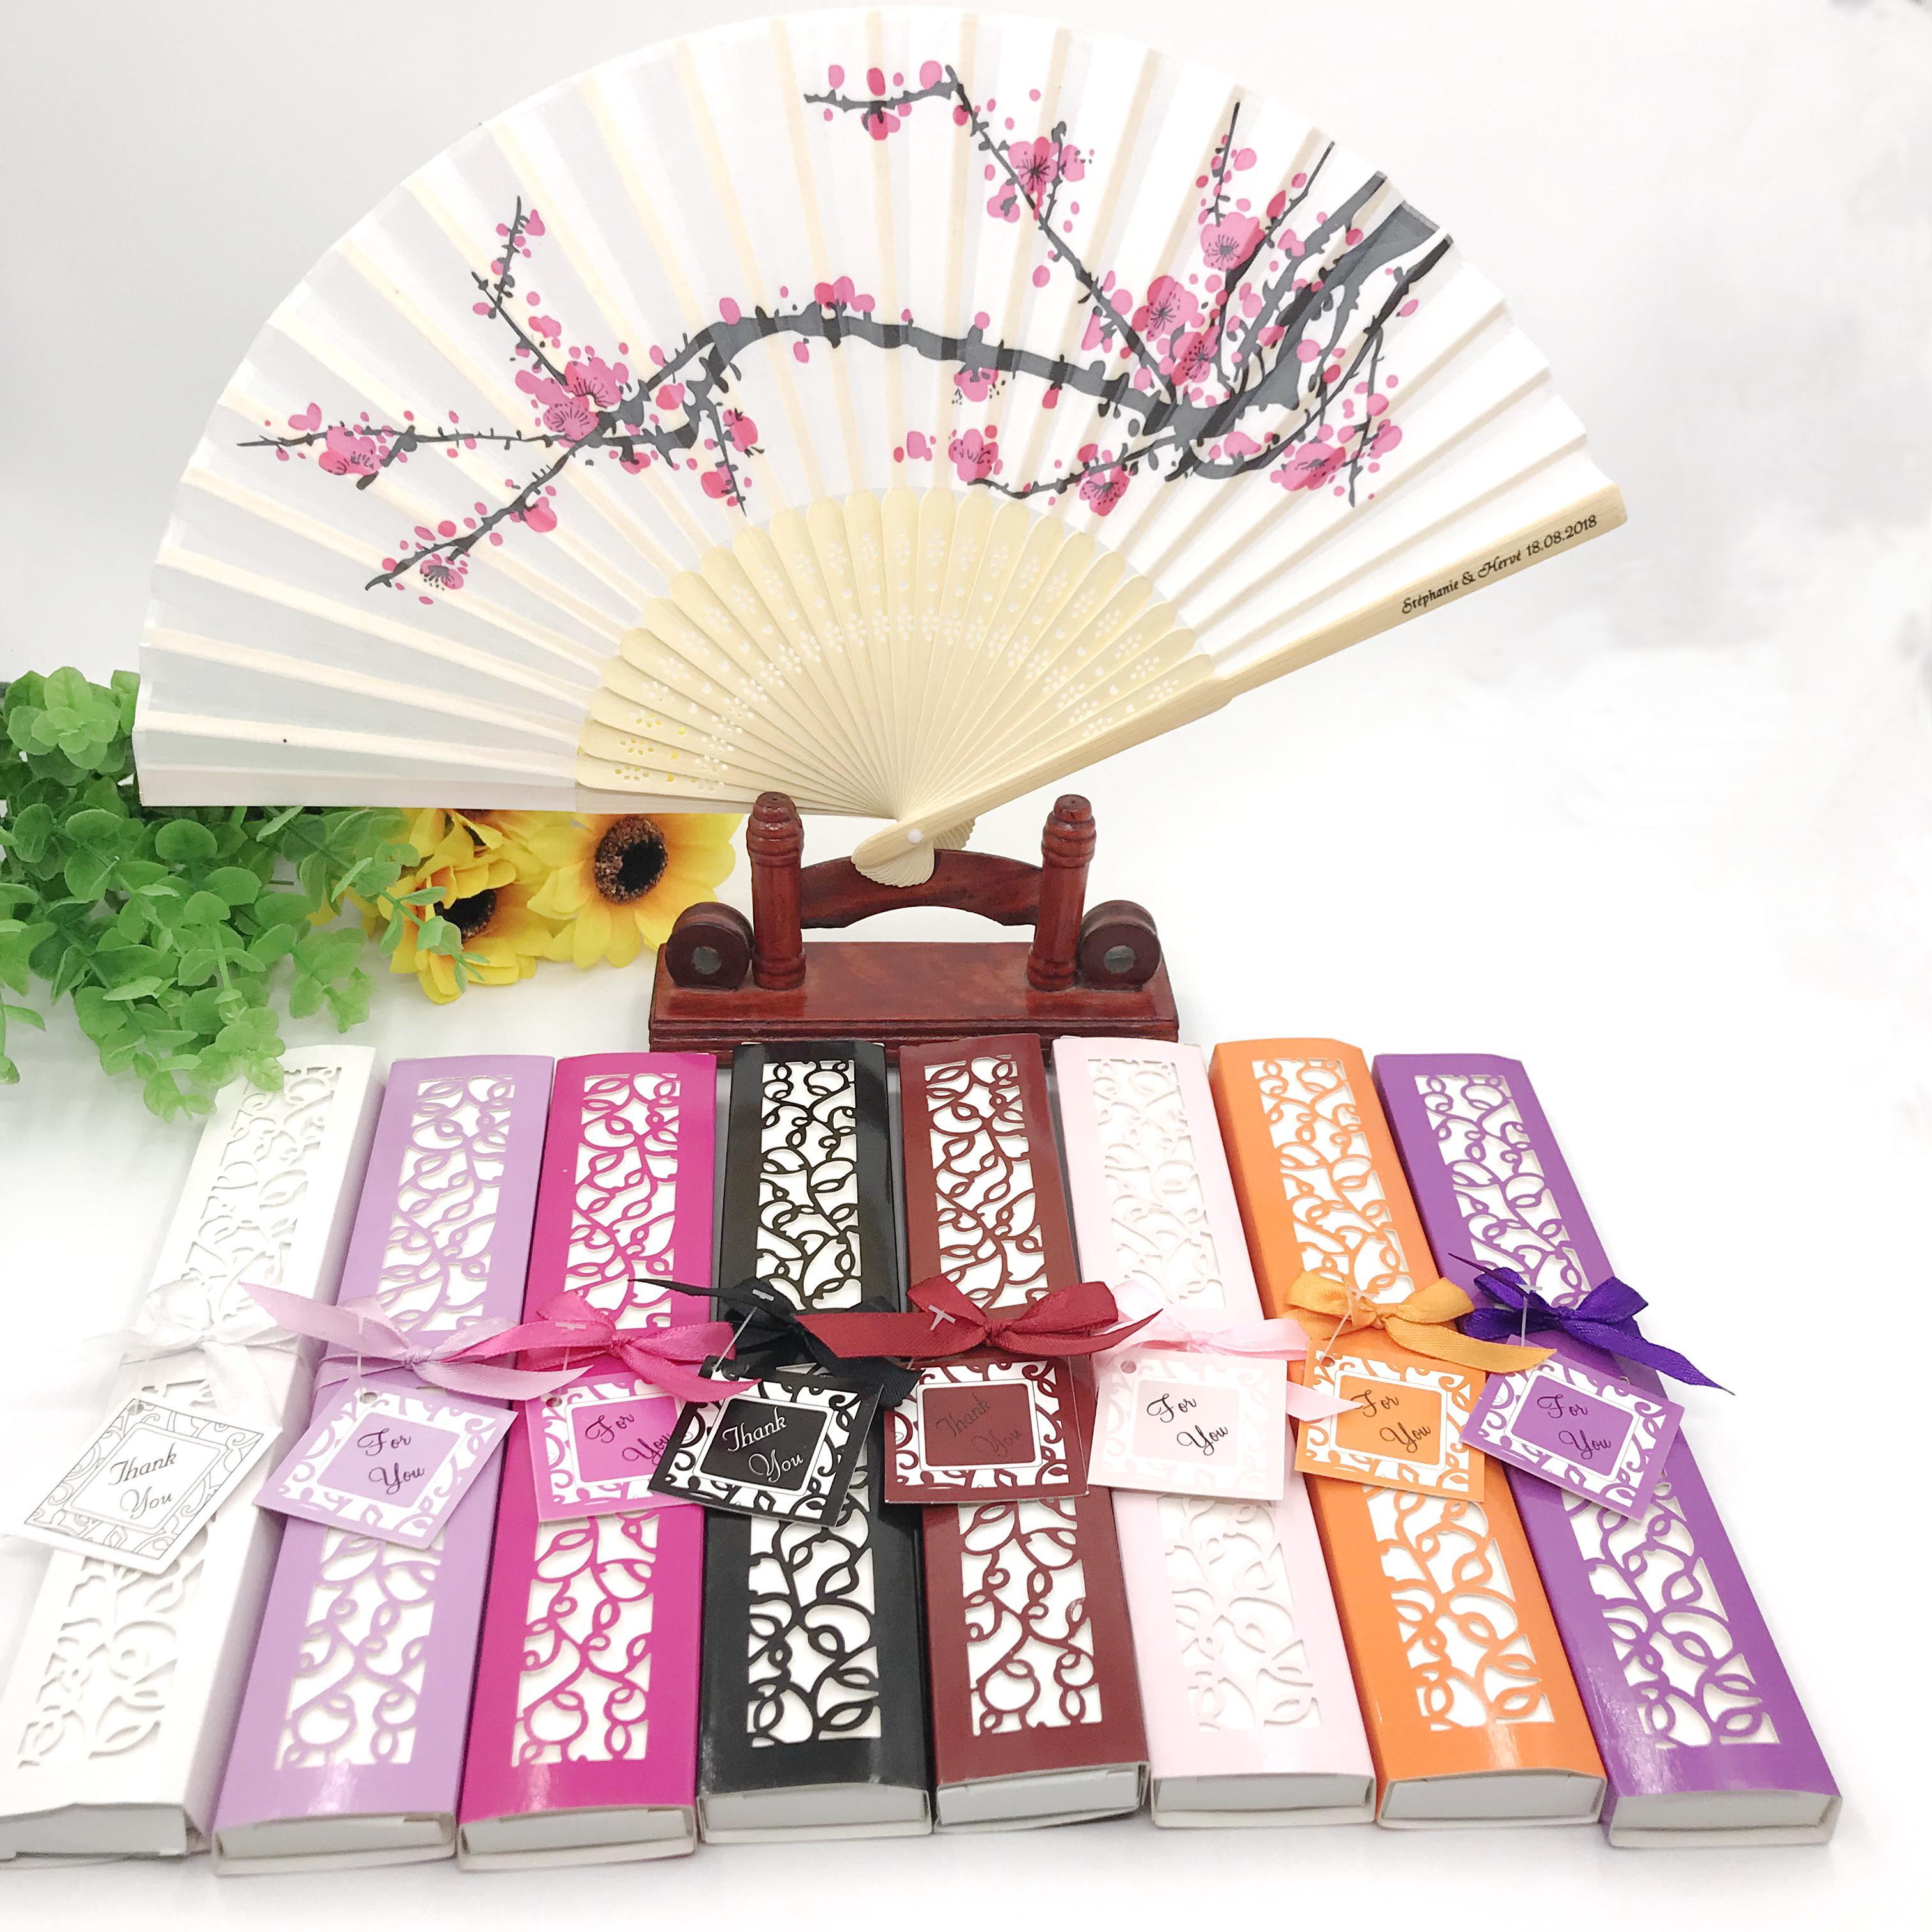 50PCS Custom Printing Bride&Groom's Name&Date Cherry Blossom Wedding Fan in Gift Box Hand-made Sakura Foldable Fans FREE SHIPPING